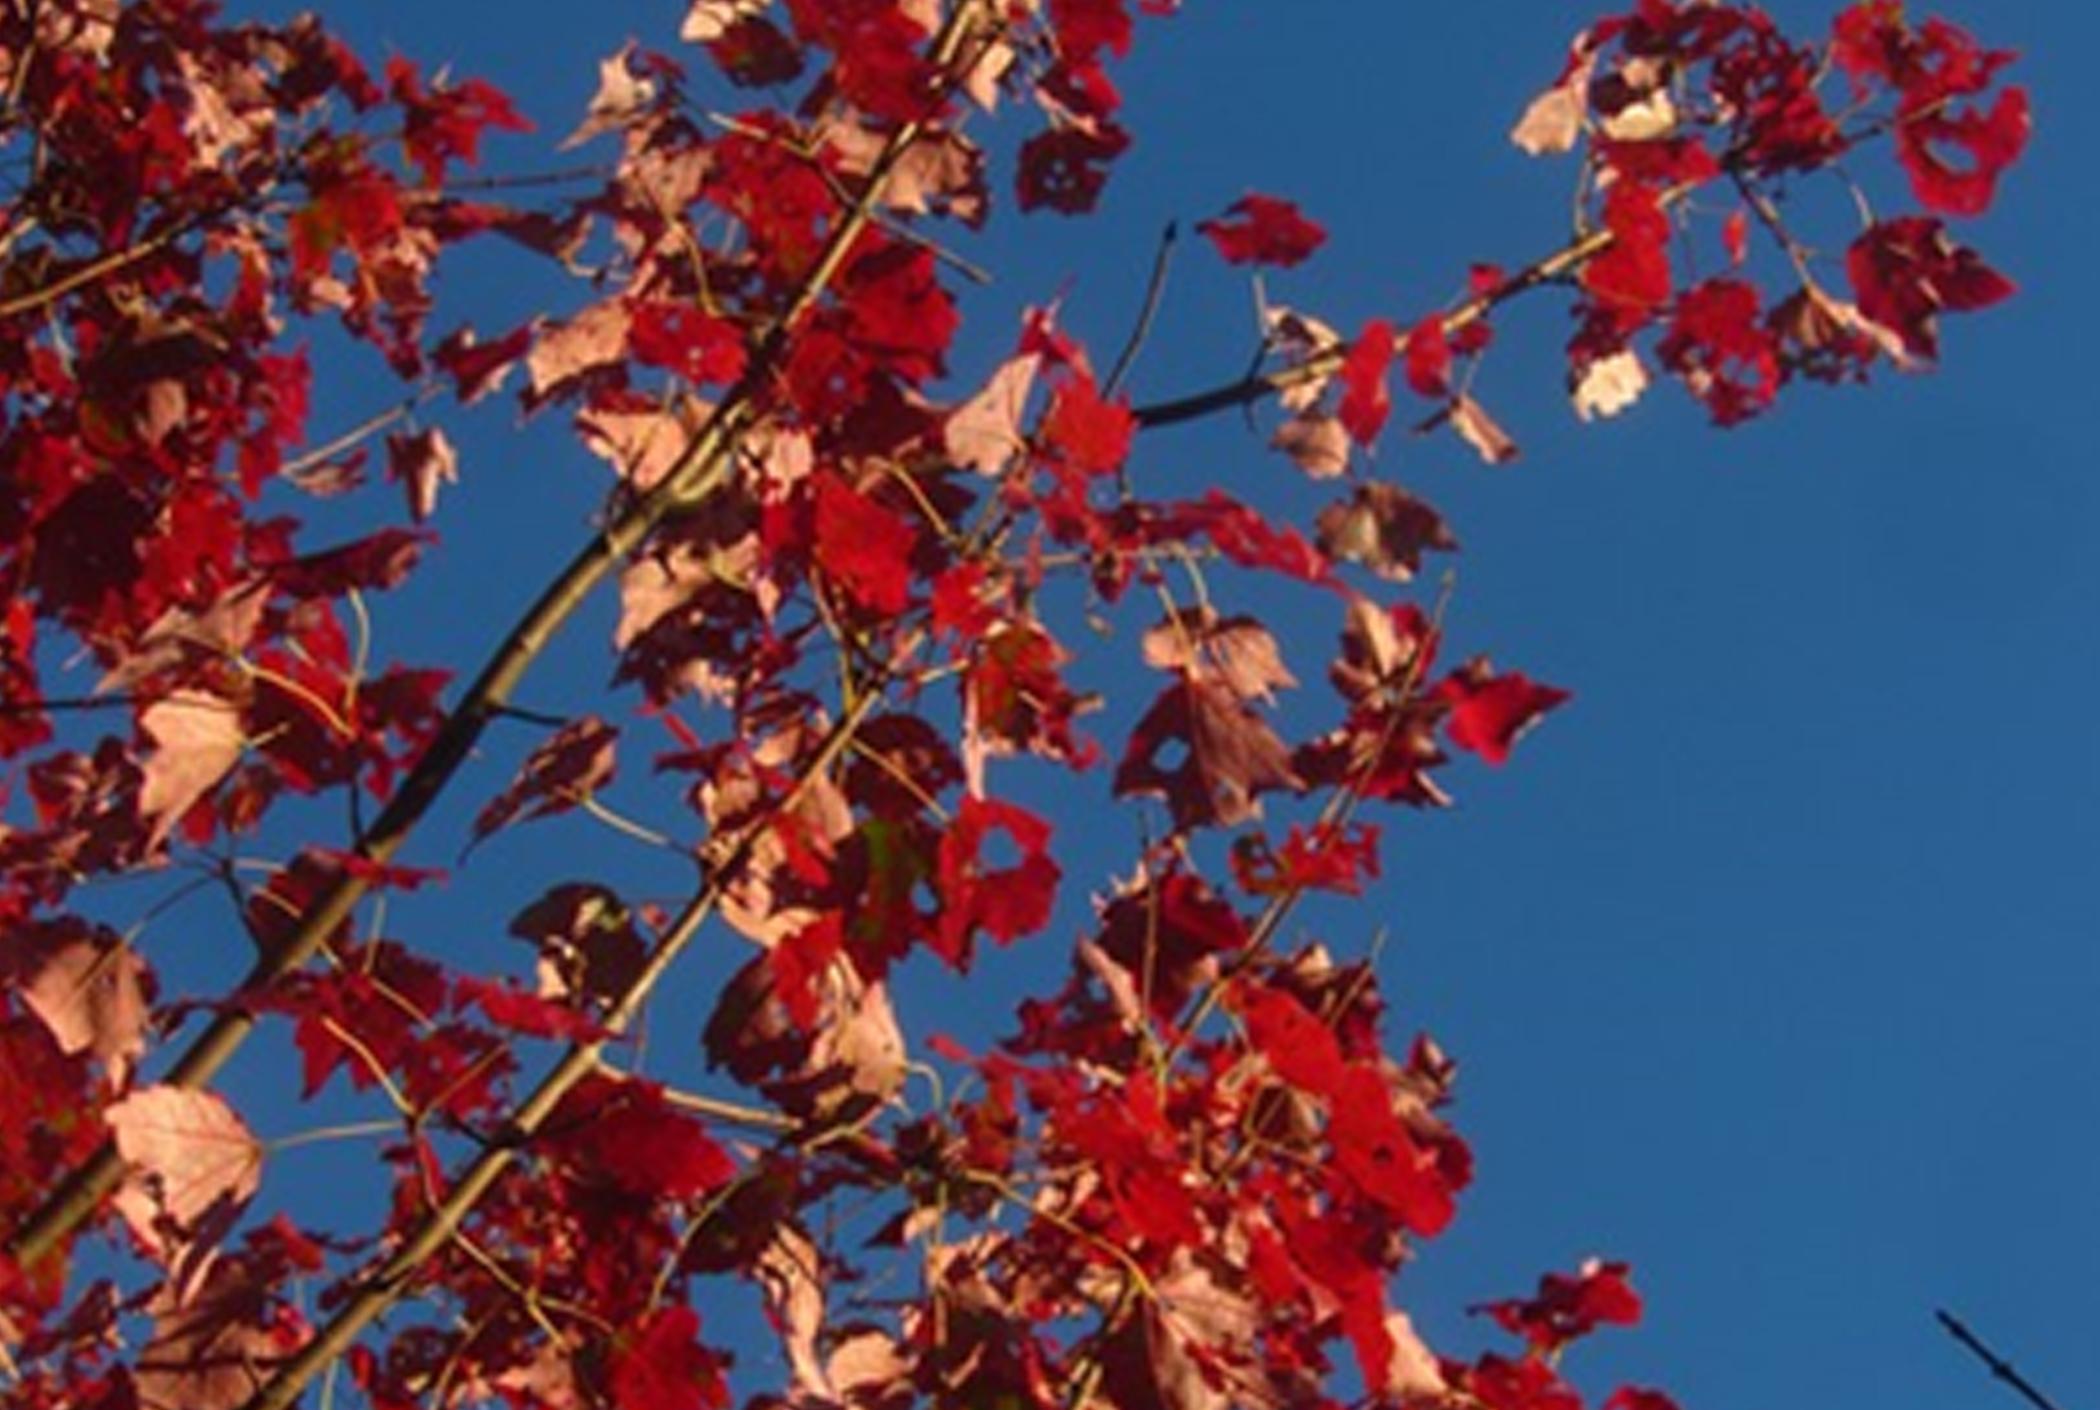 Leaves of Acer rubrum 'Schlesingeri' in fall color